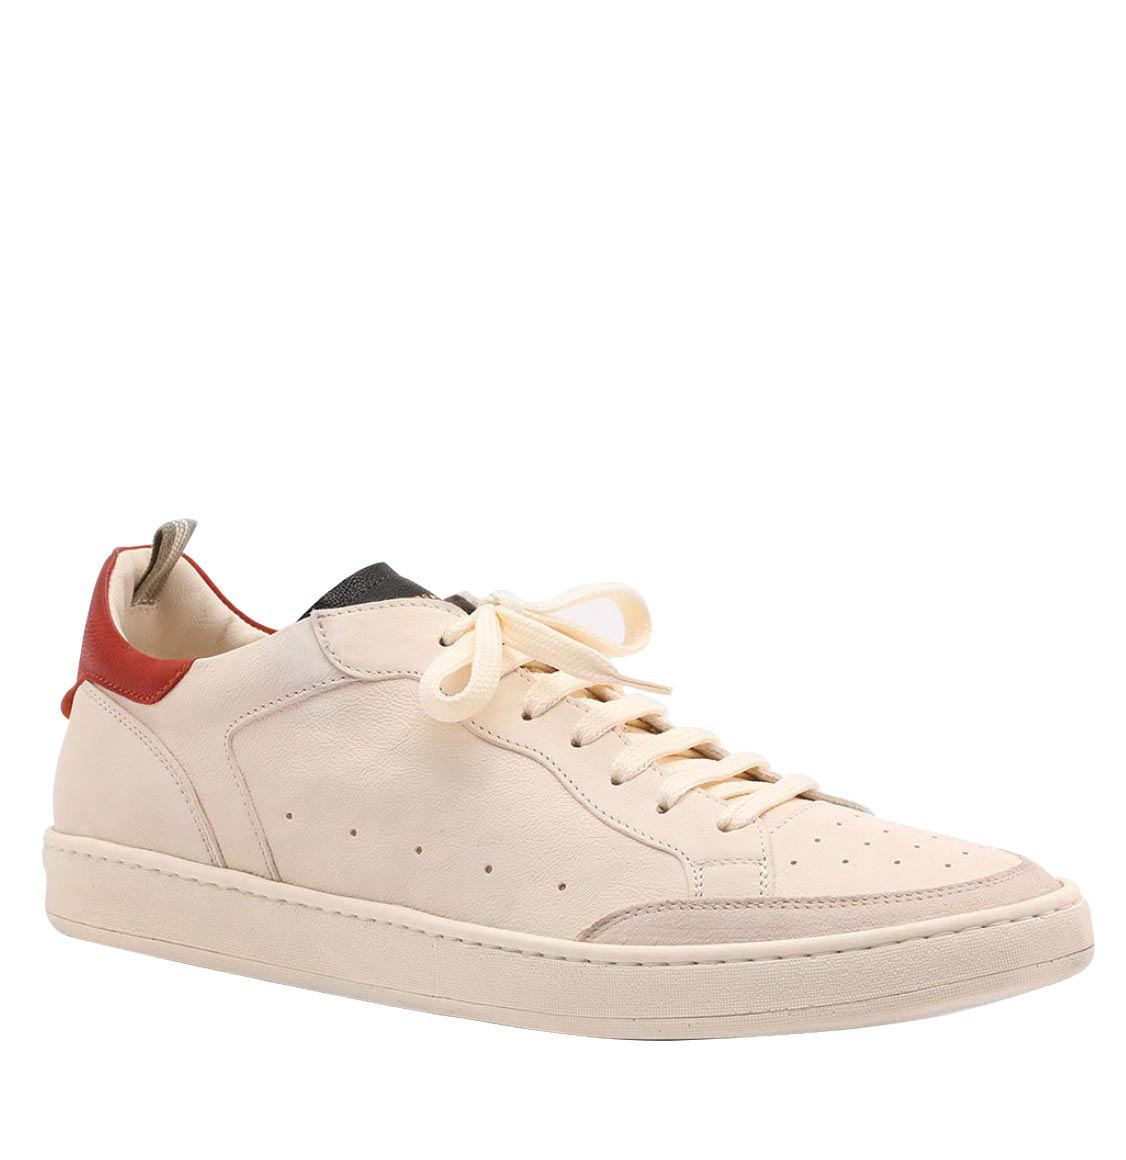 Officine Creative Kareem Ivory Leather Sneakers